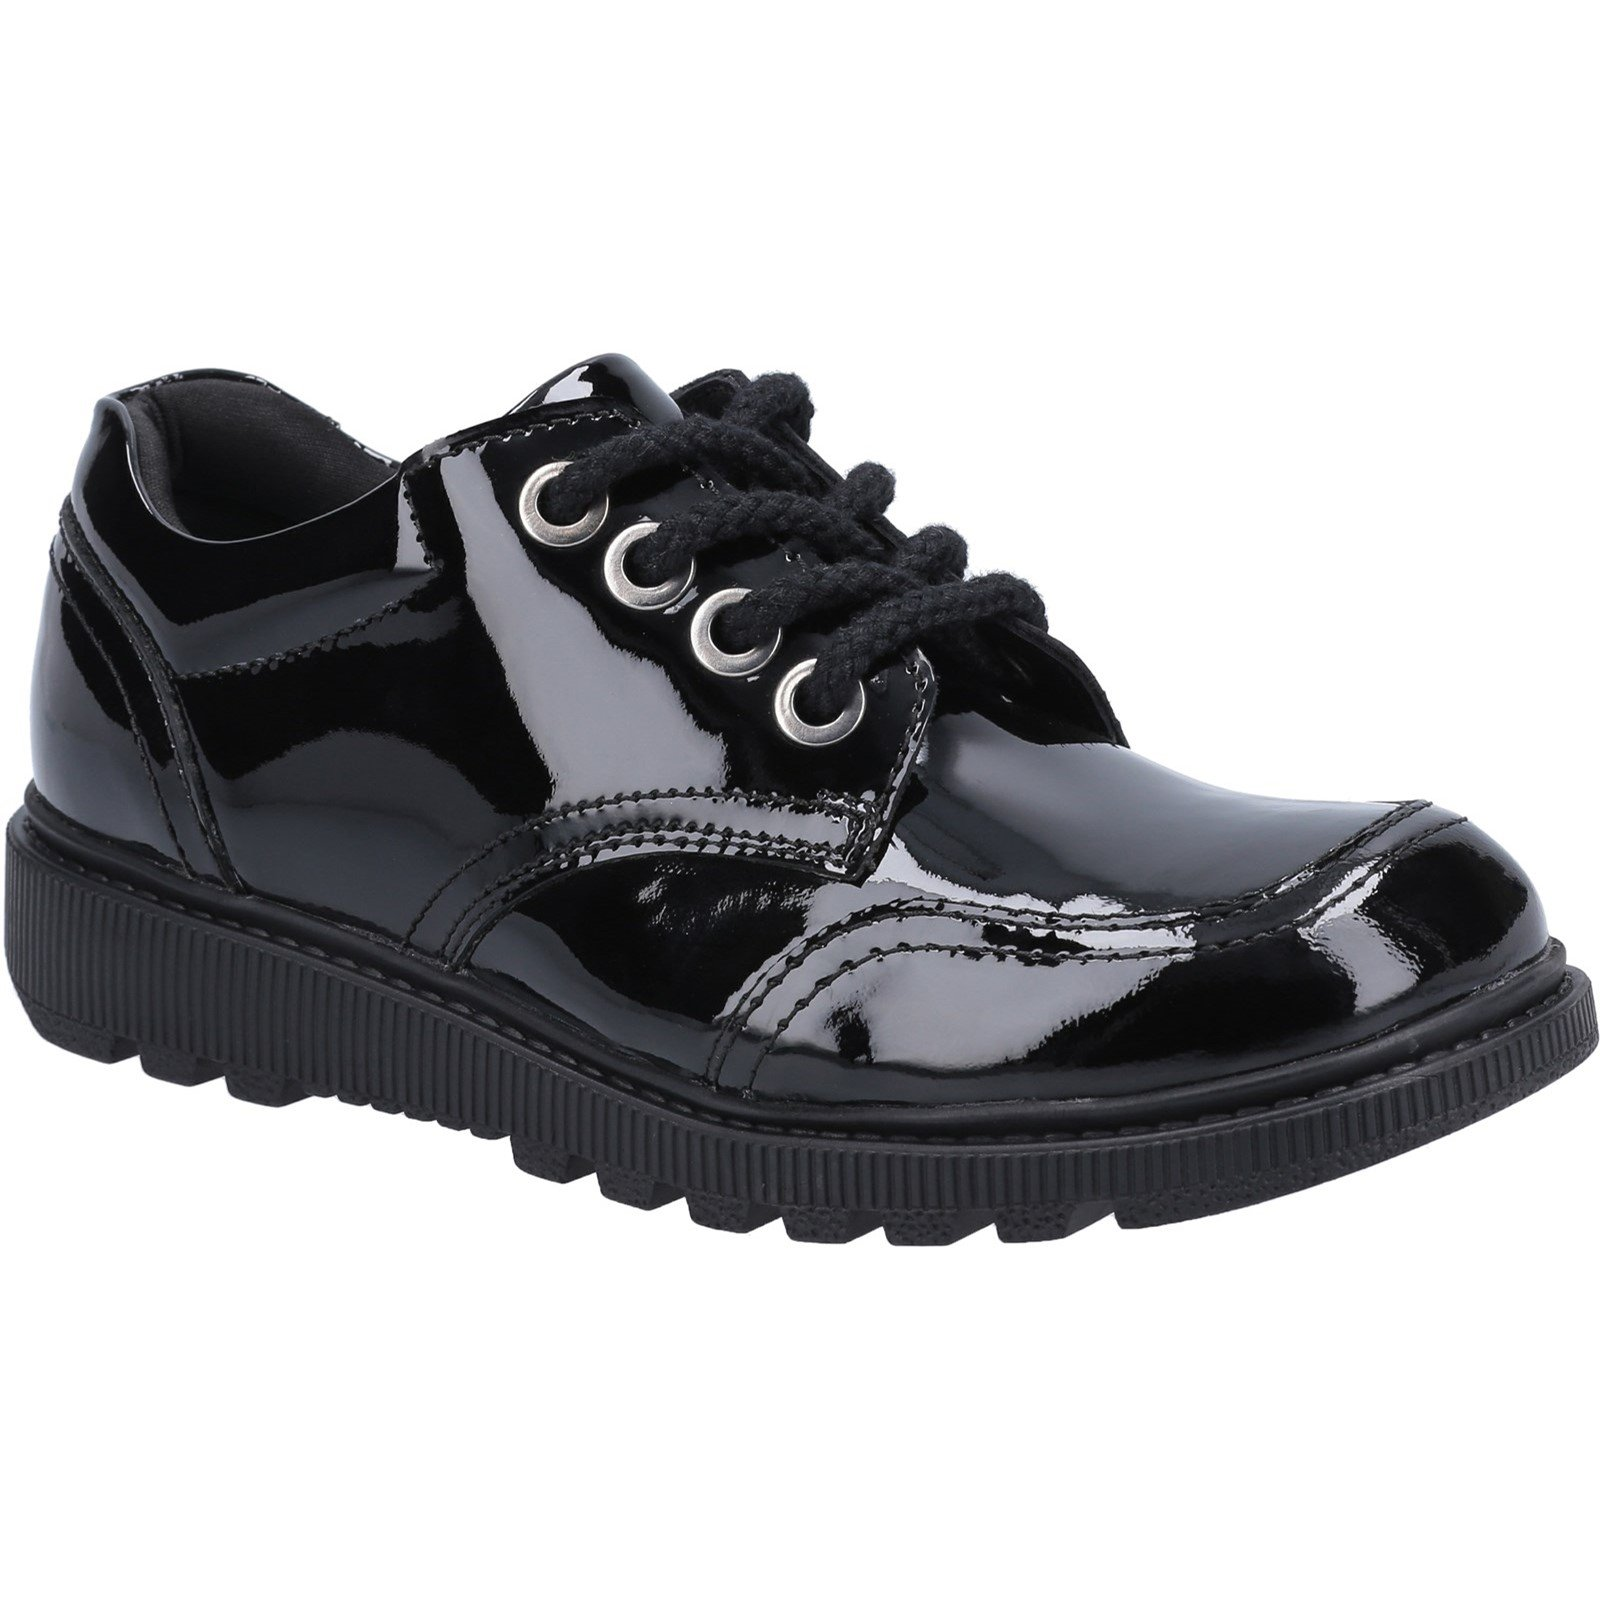 Hush Puppies Kid's Kiera Senior Patent School Shoe Black 30824 - Patent Black 5